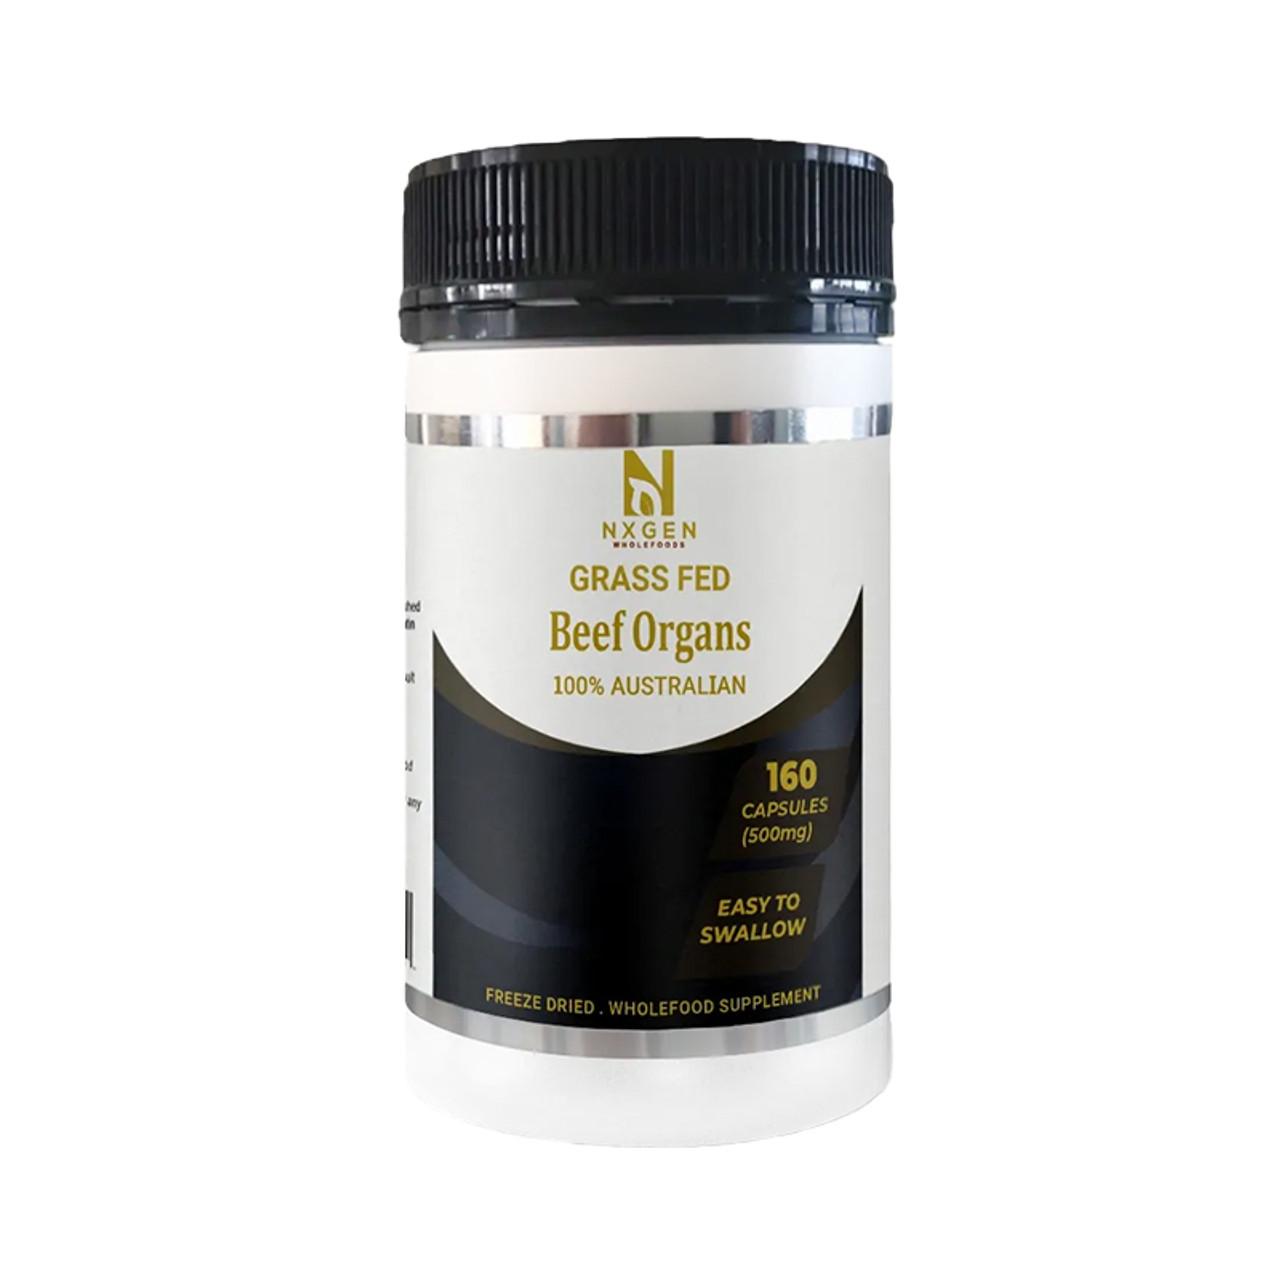 Front view of a bottle of NXGEN 100% Australian Beef Organs supplement.